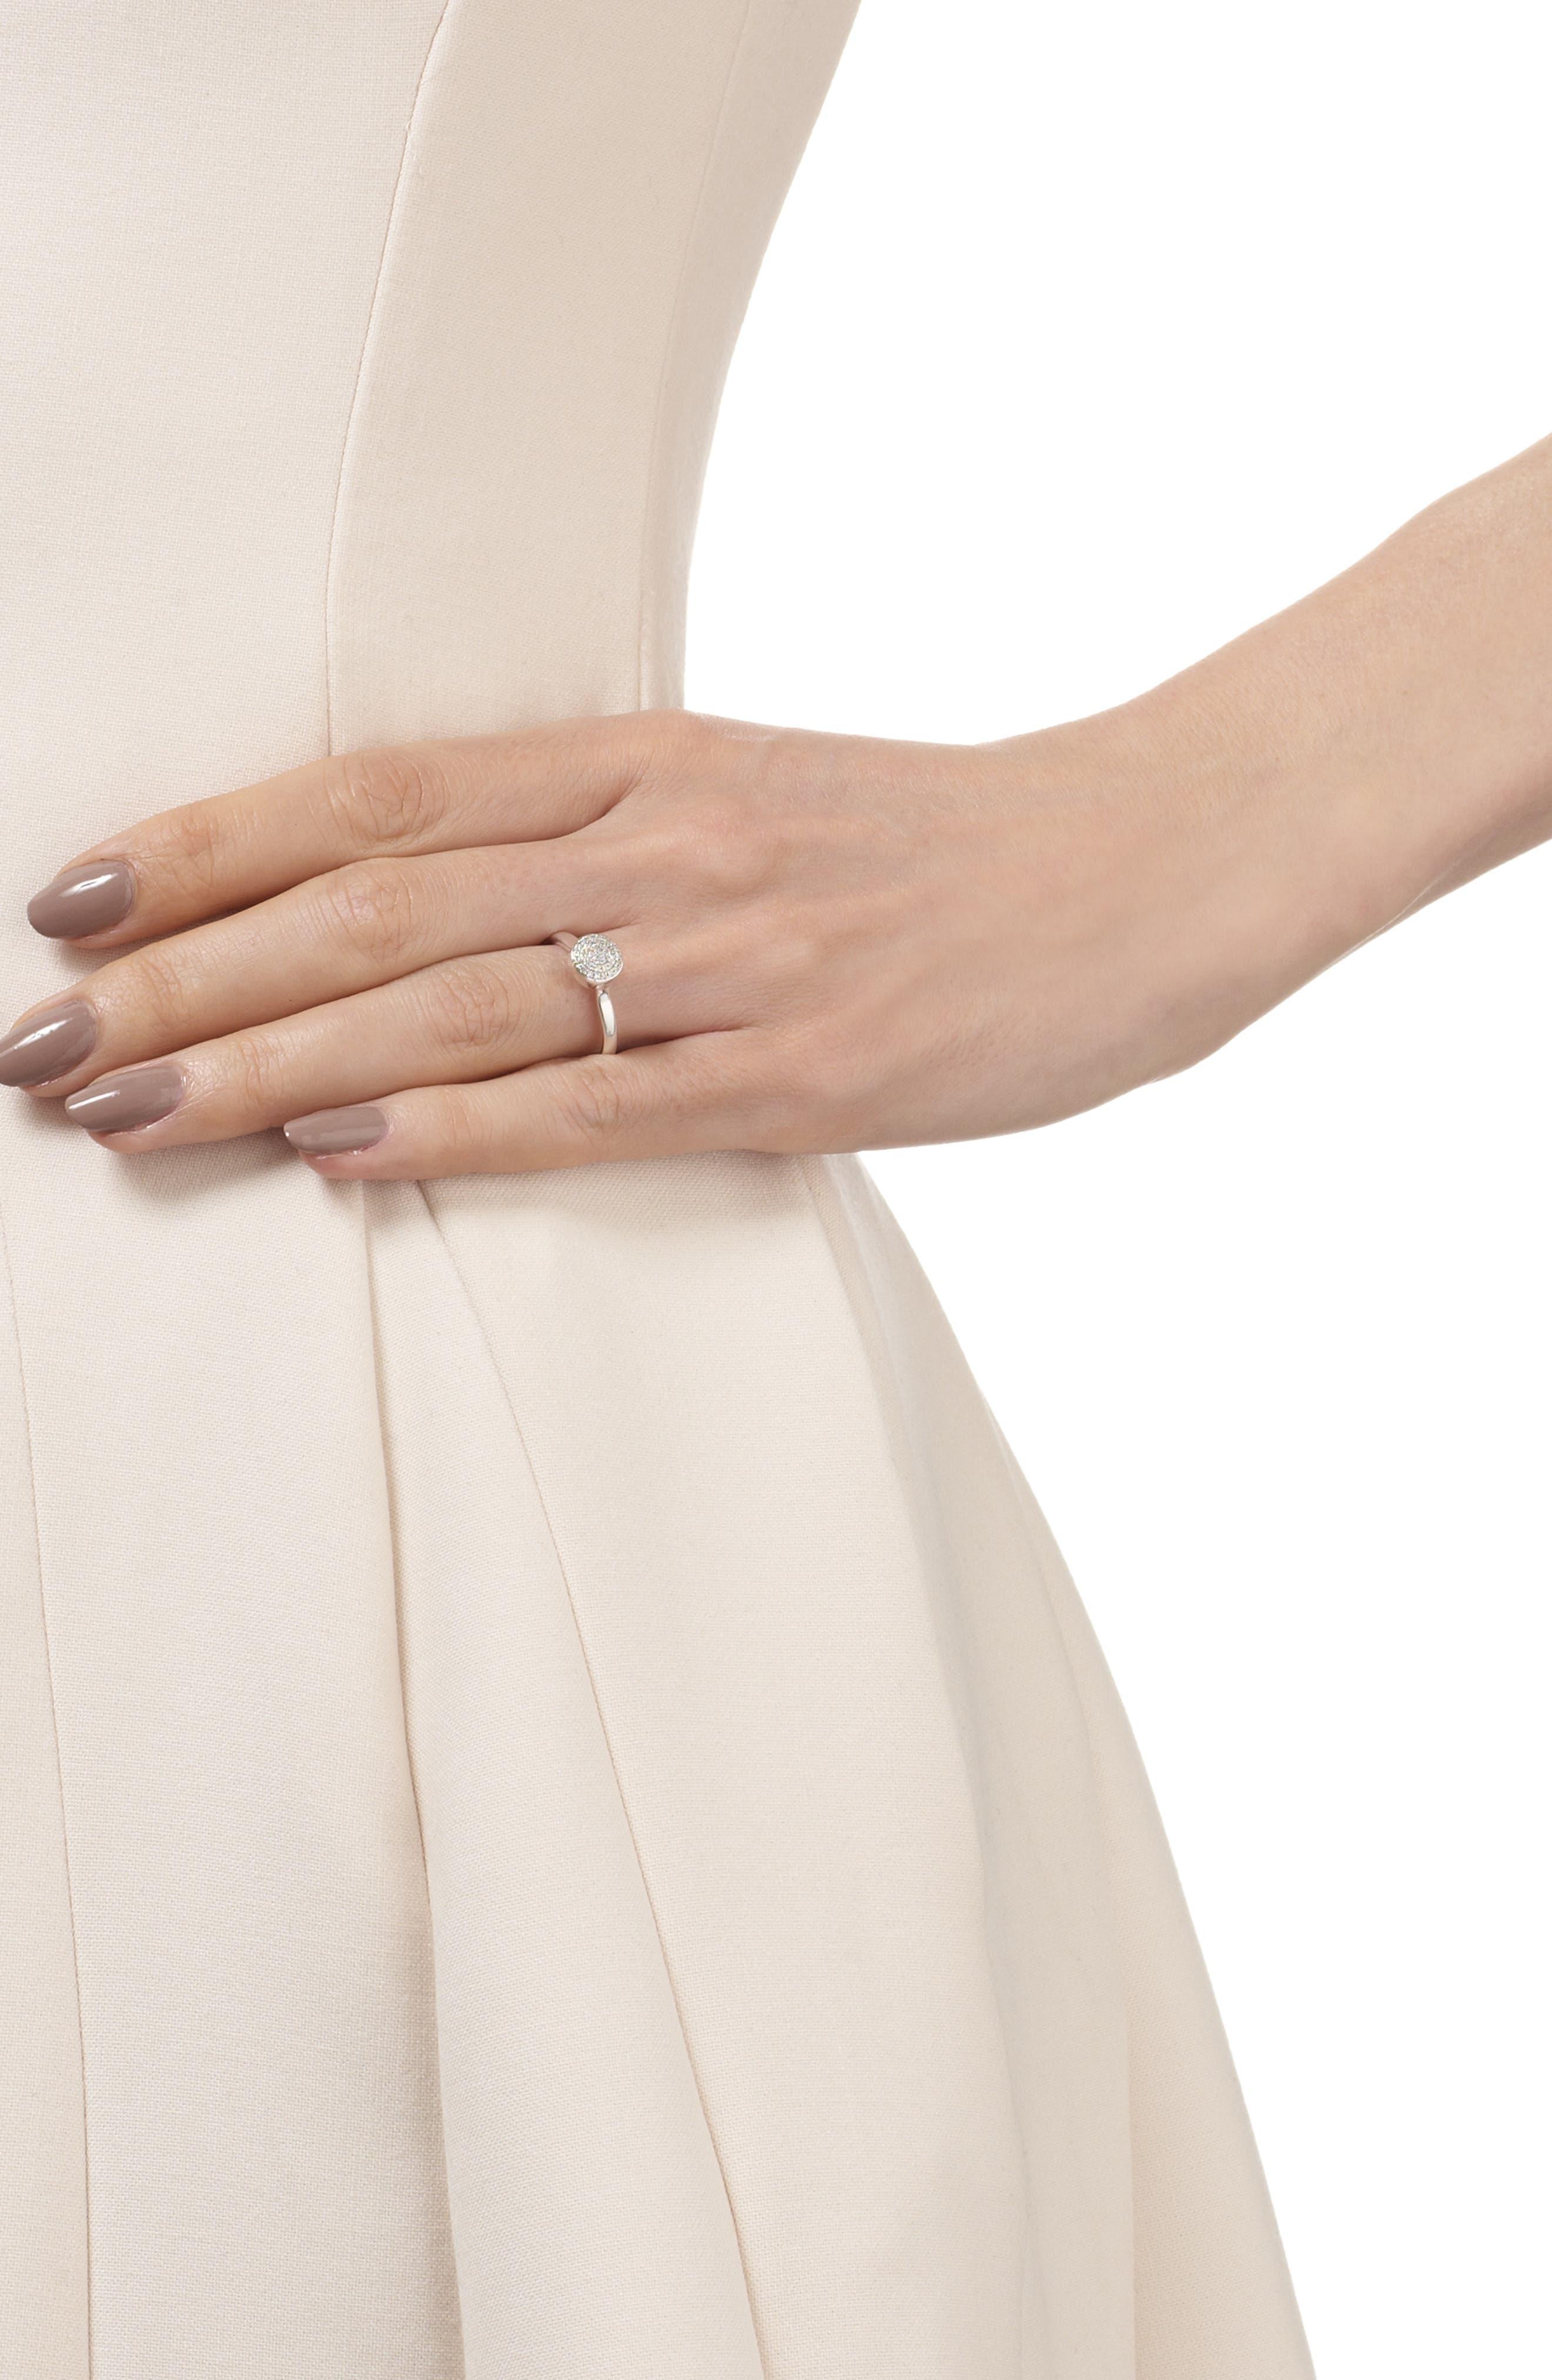 MONICA VINADER, Ava Diamond Button Ring, Alternate thumbnail 2, color, SILVER